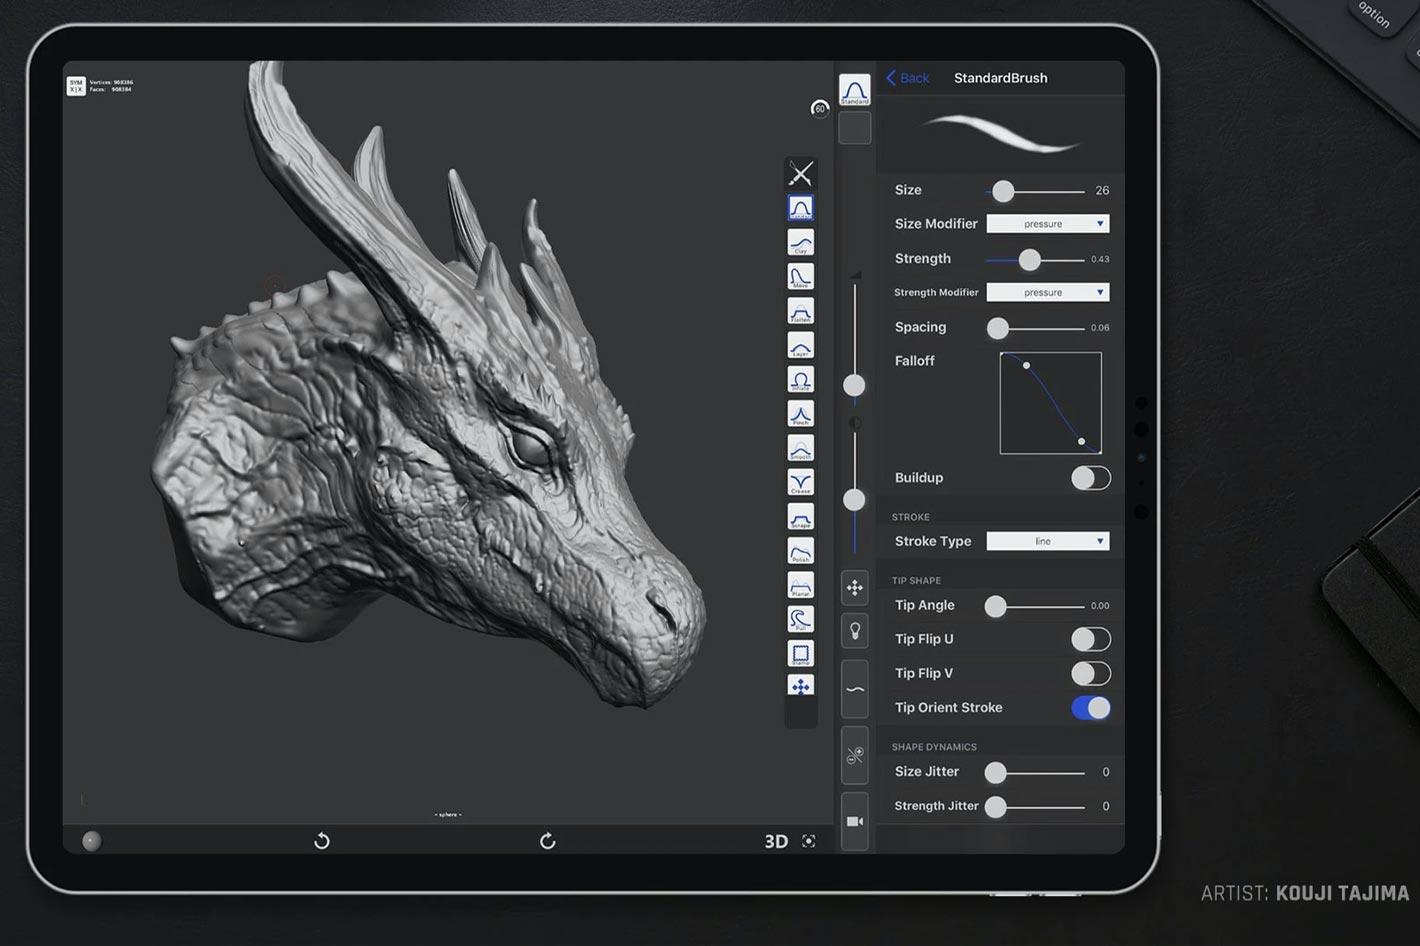 Maxon acquires digital sculpting app forger for iOS